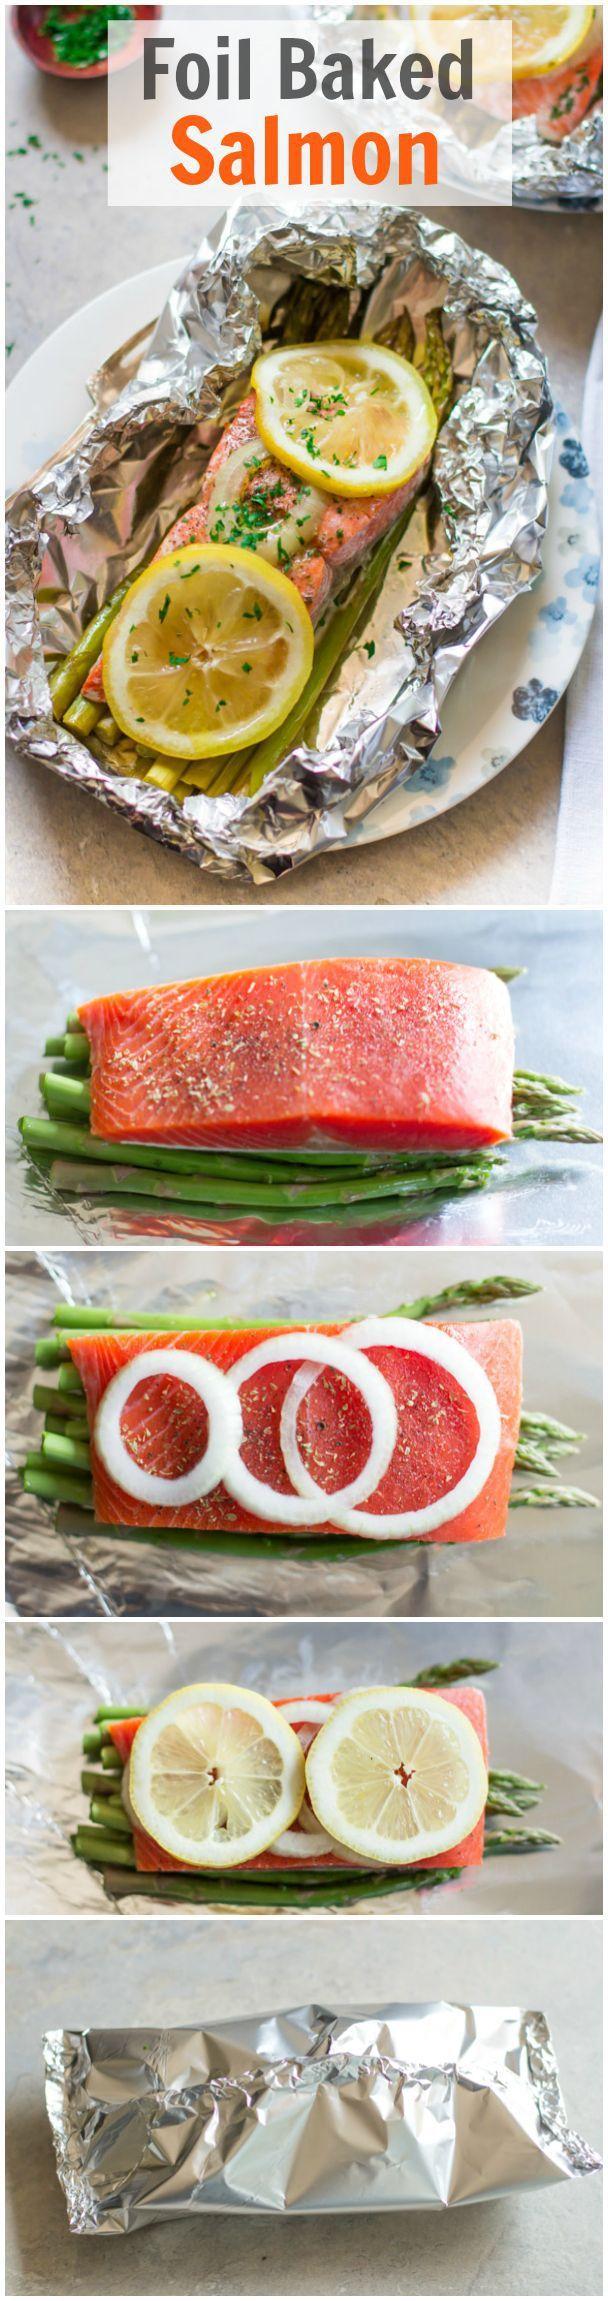 Asparagus Salmon in a Foil